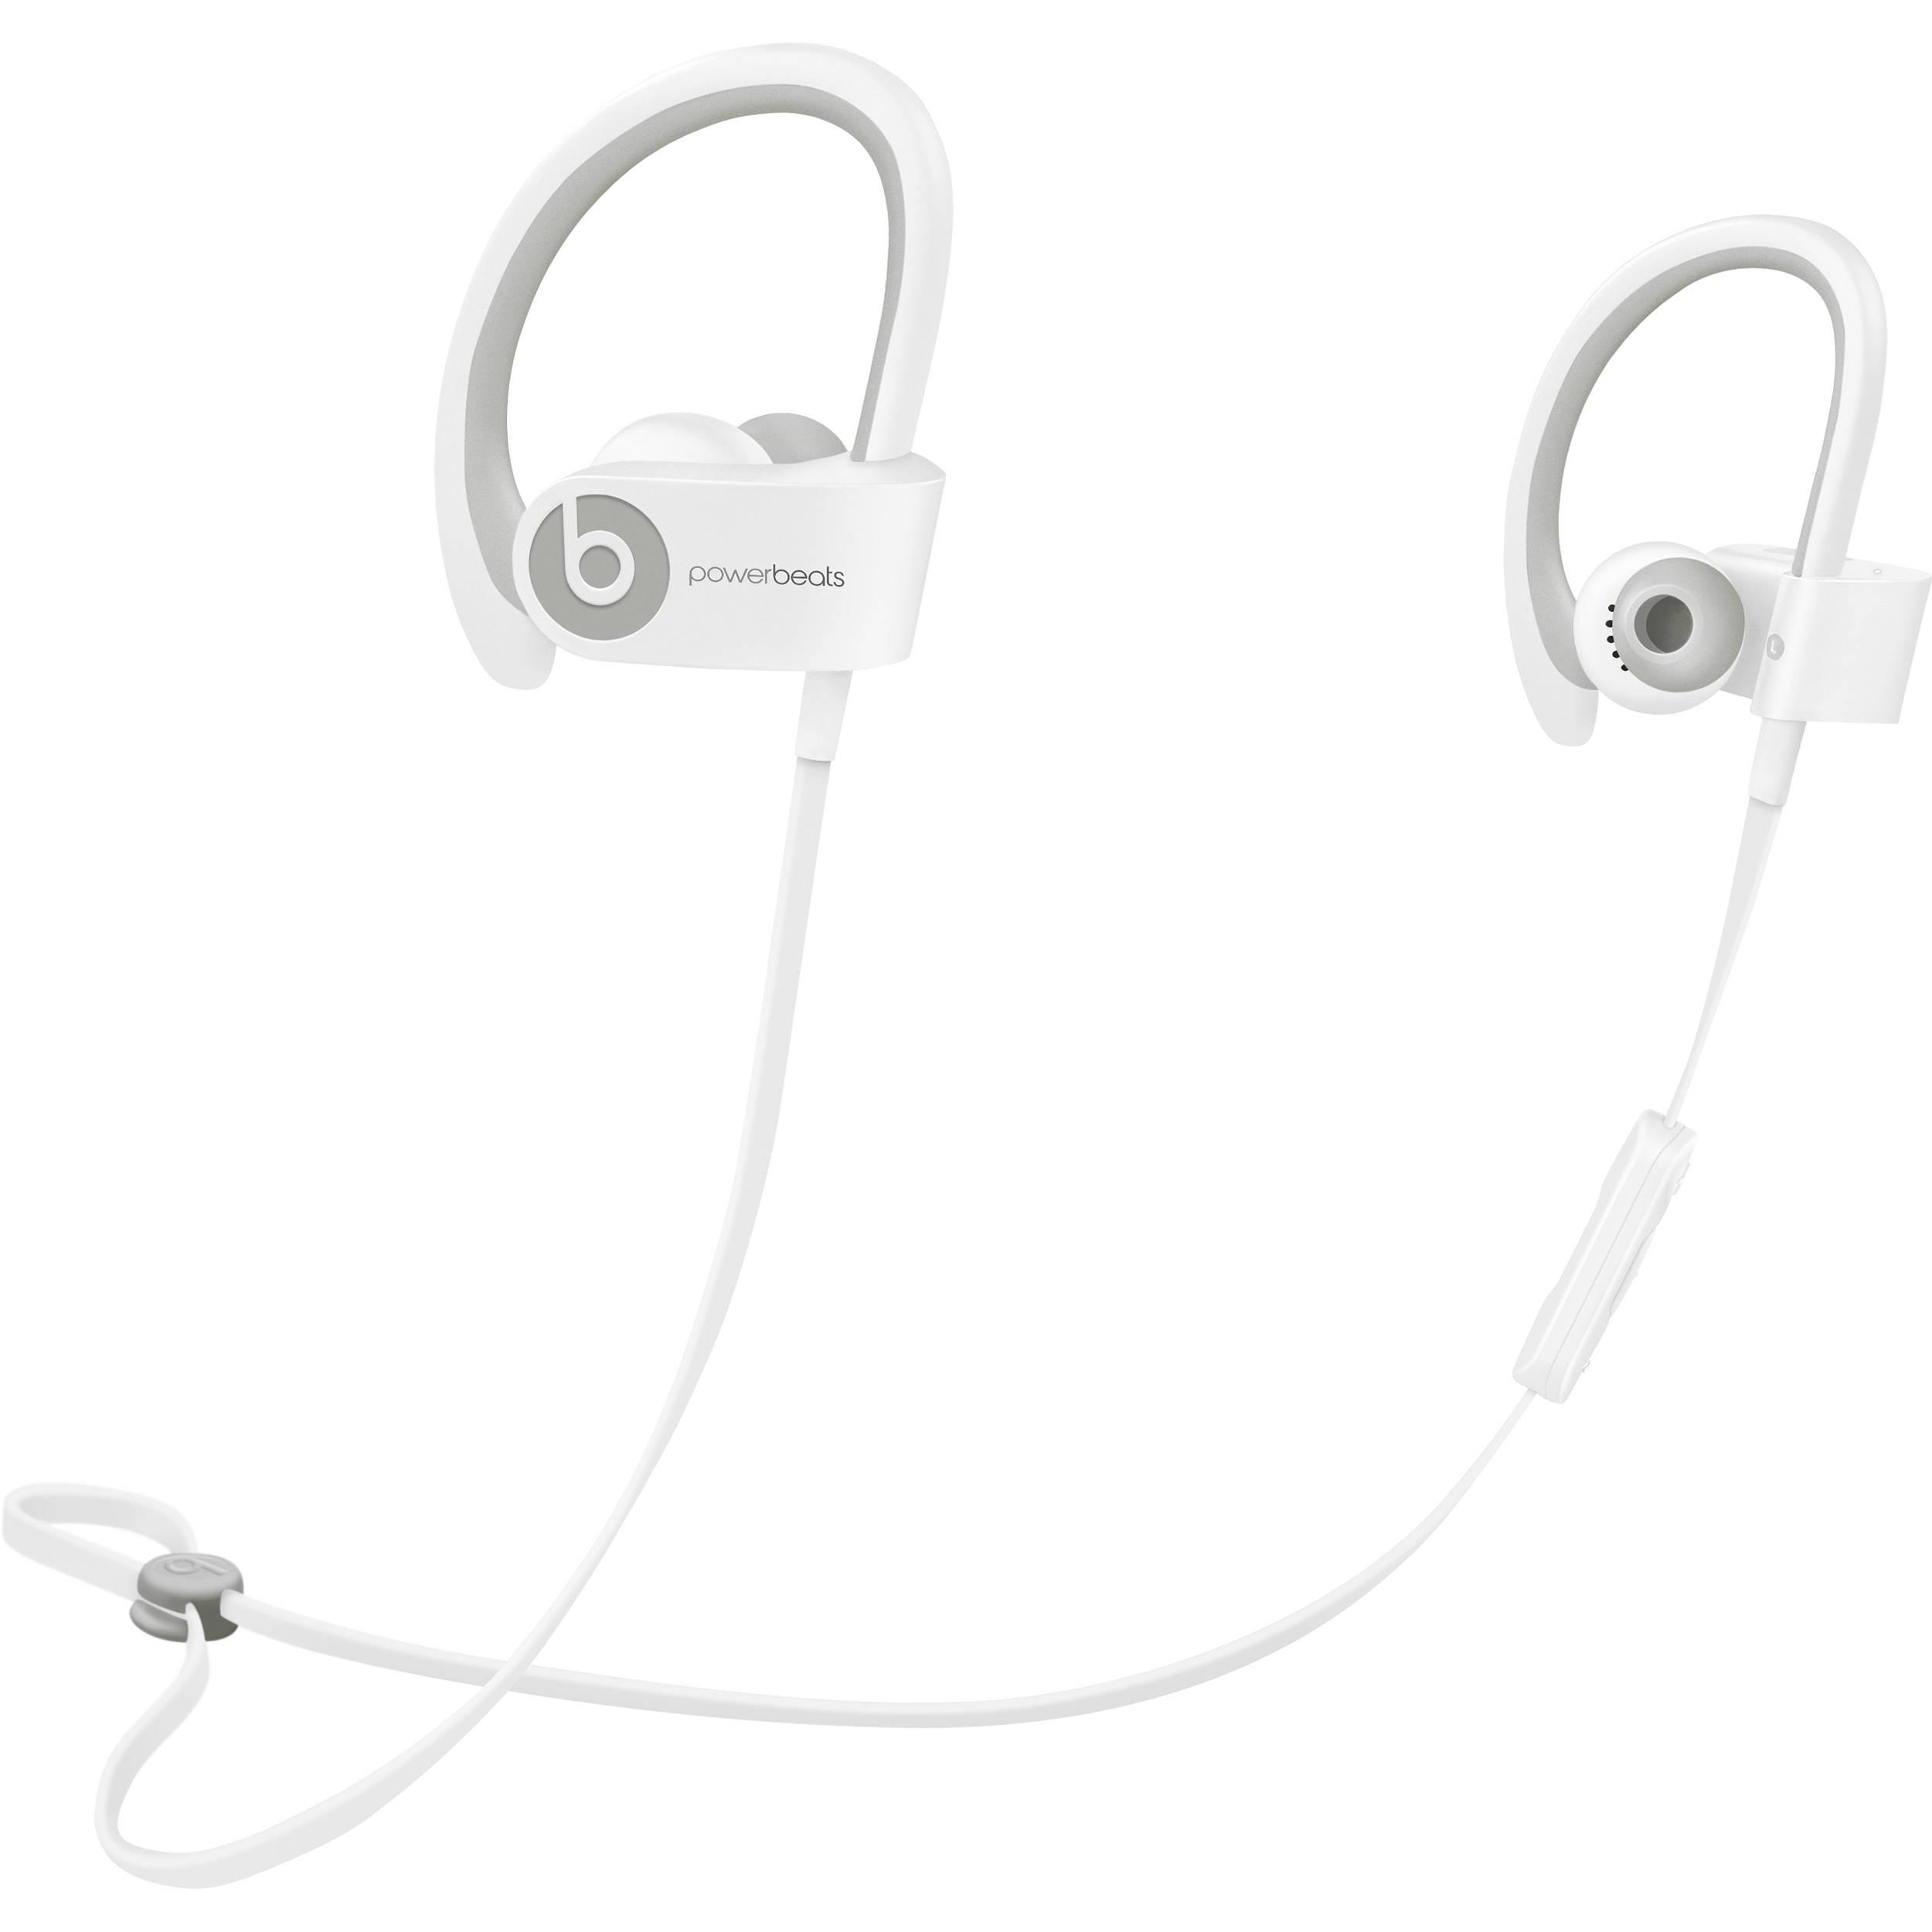 Beats By Dr Dre Powerbeats2 Wireless Earbuds White